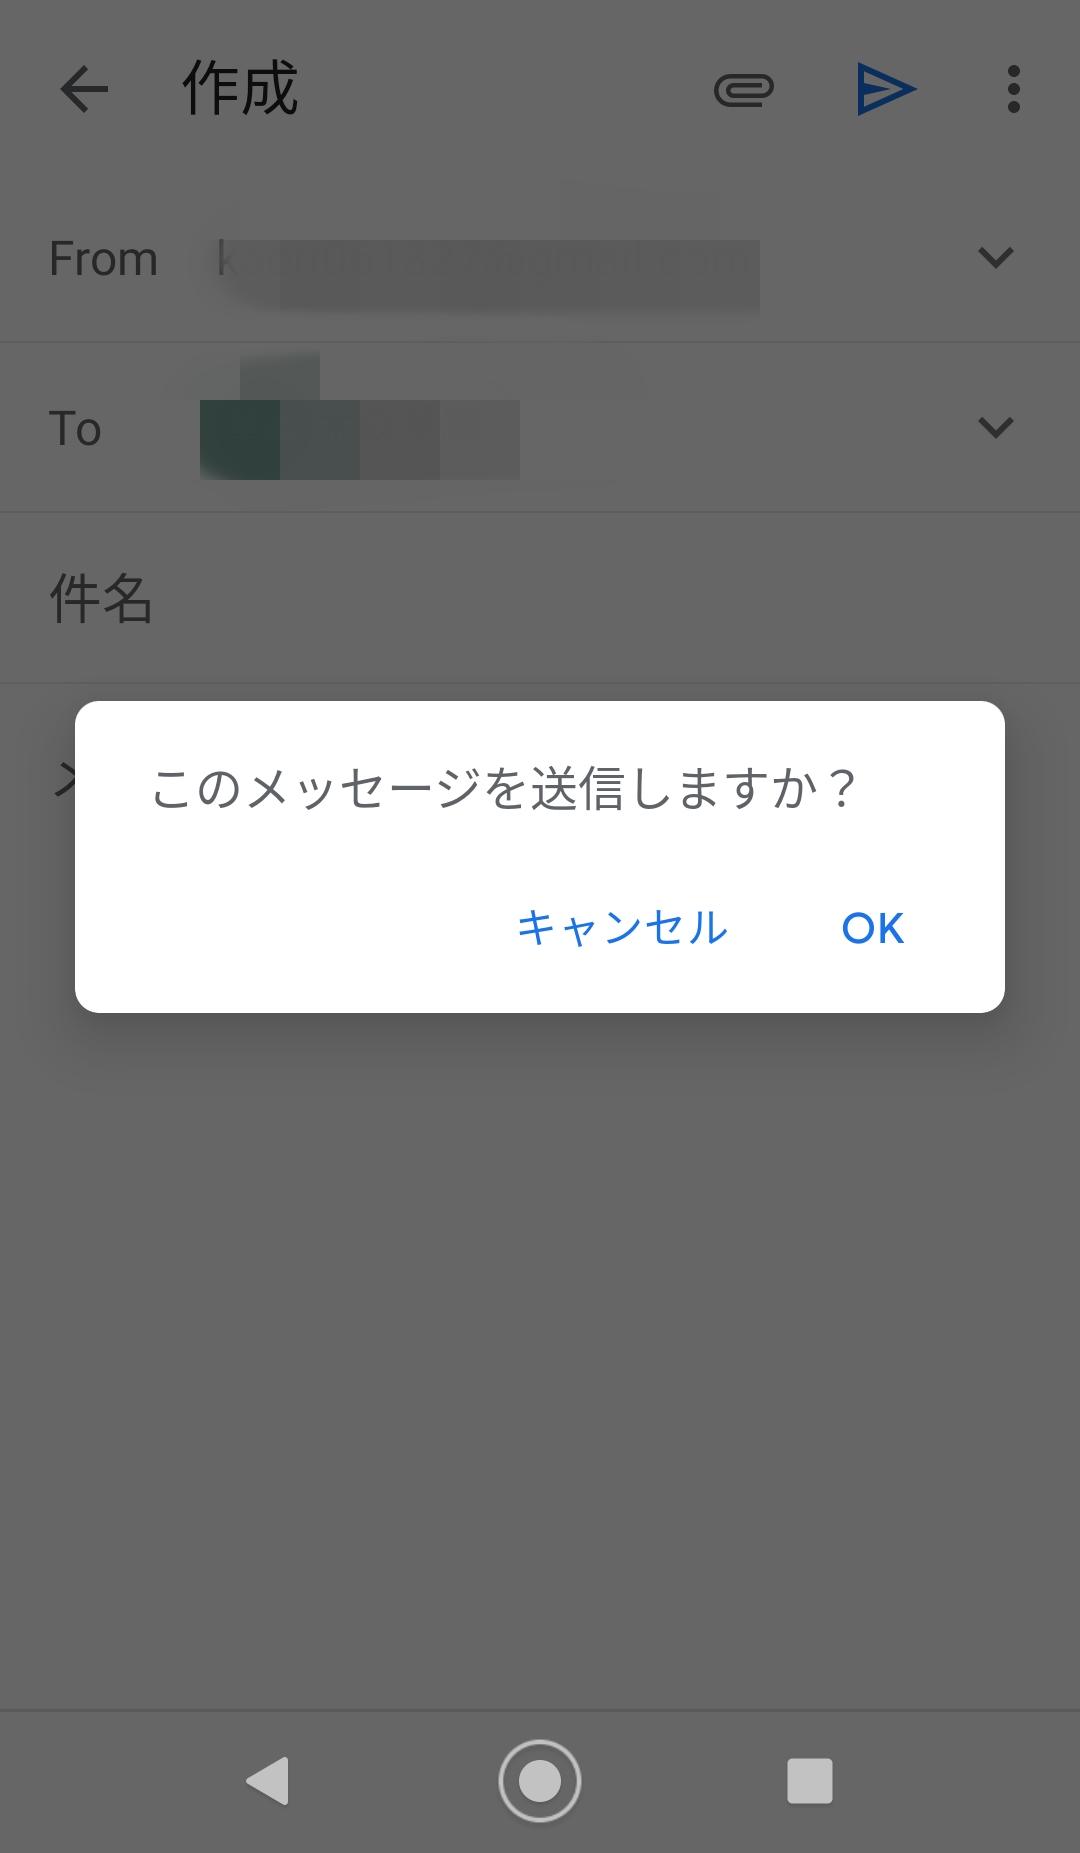 Gmail Android 送信 確認 画面 表示 可能